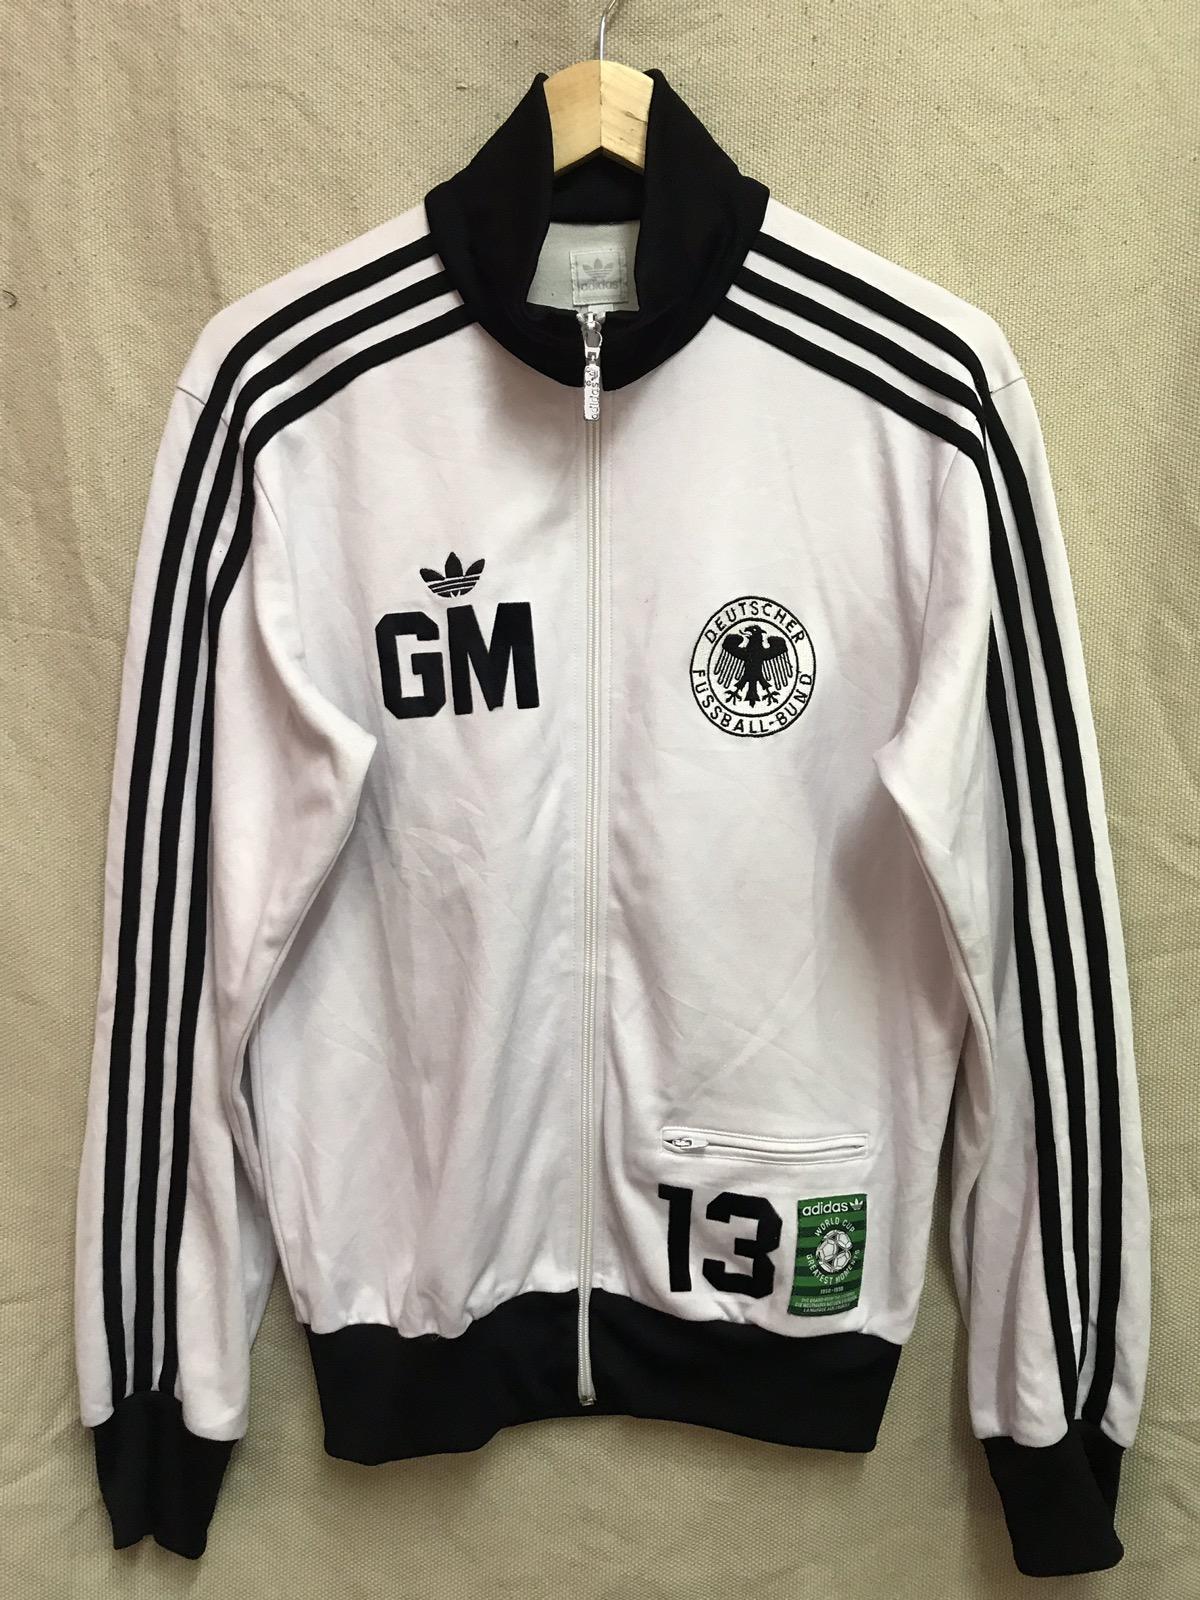 4f0be73ad Vtg Adidas Originals Der Bomber Gerd Müller Limited Edition World Cup  Greatest Moments Jacket